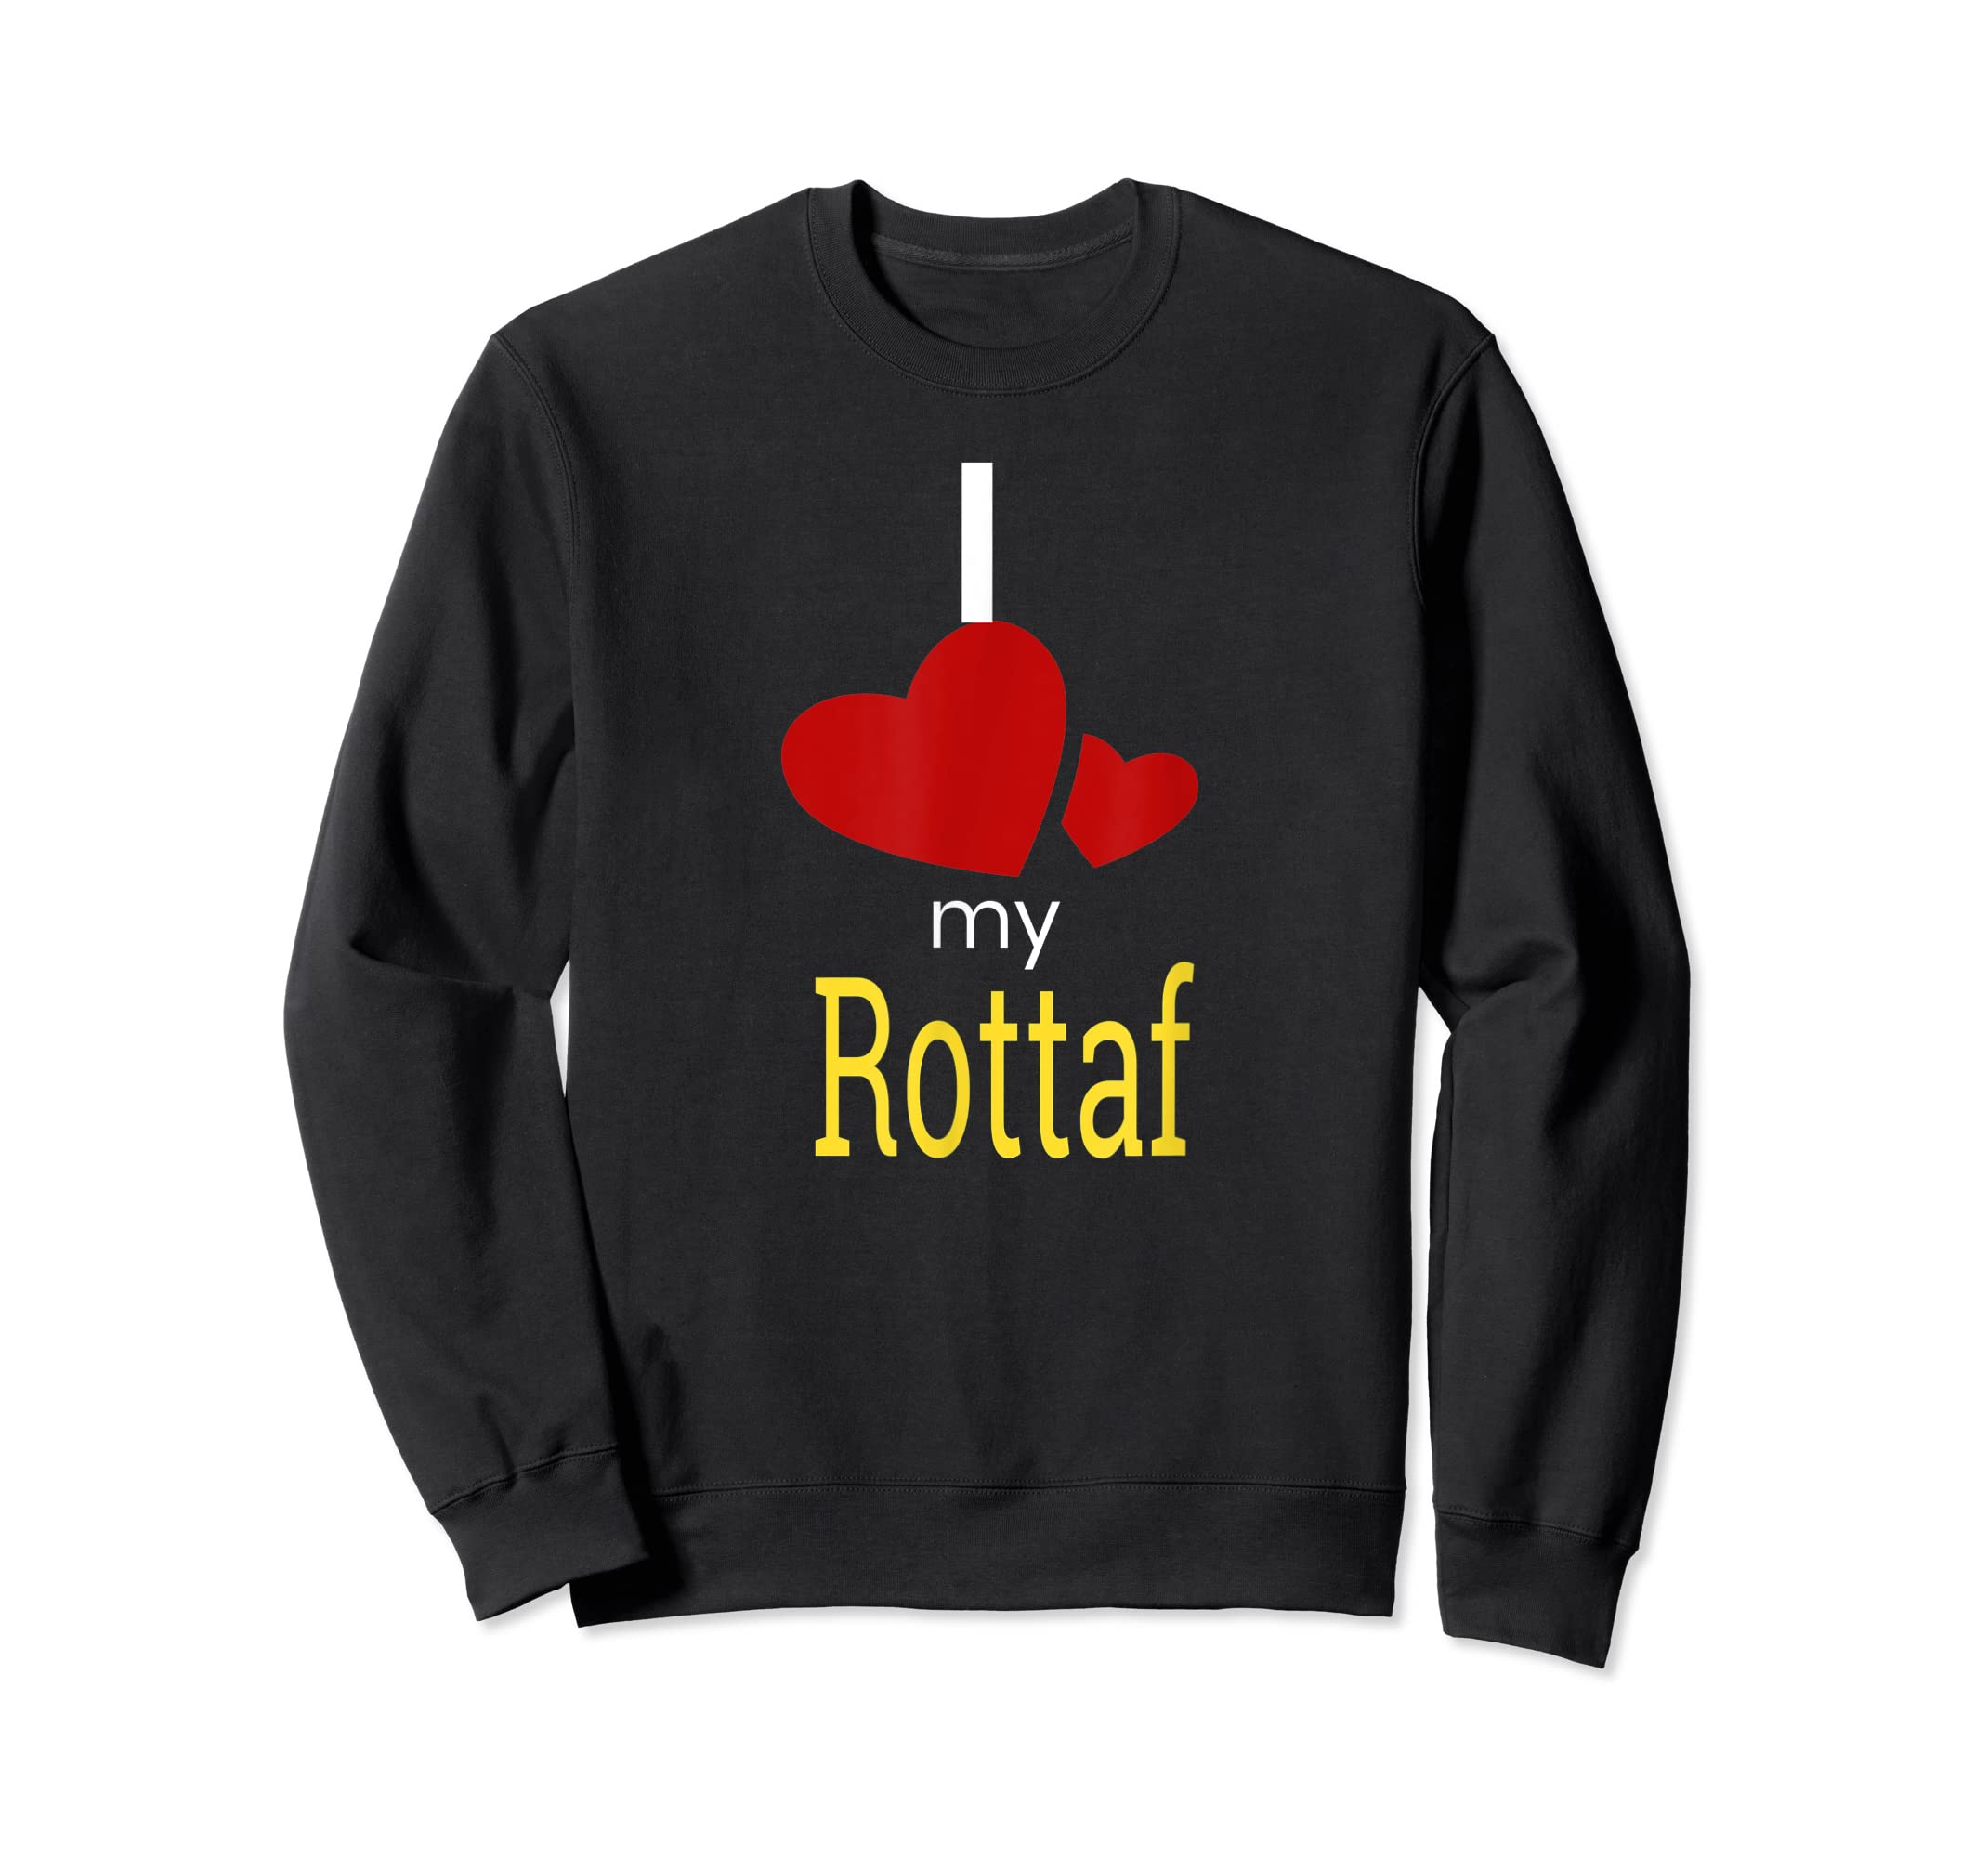 Rottaf Dog Shirt Love Rottweiler + Afghan Hound = T-Shirt-Sweatshirt-Black